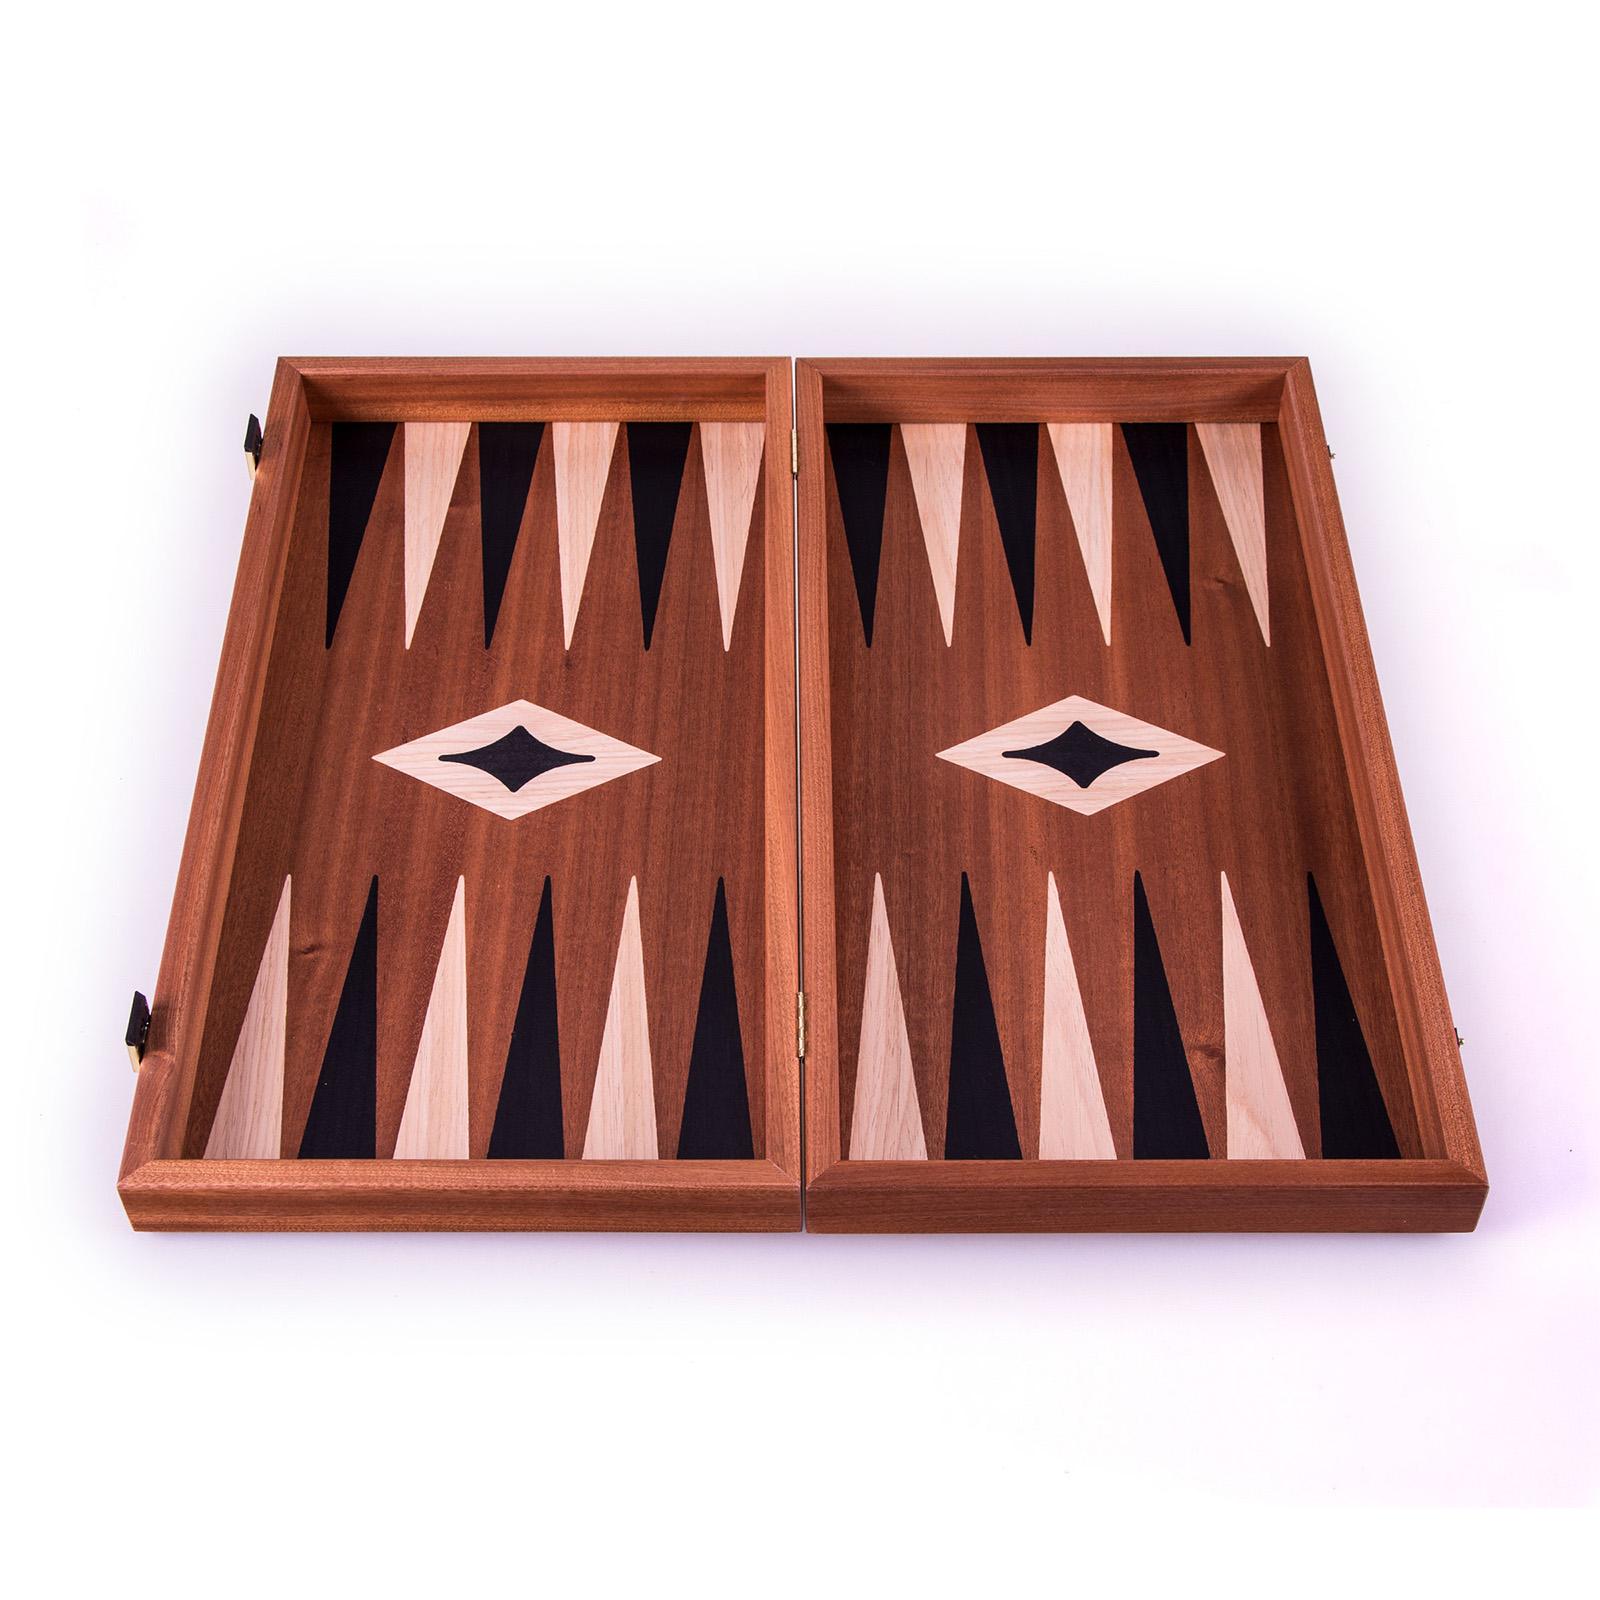 Backgammon-Set aus Mahagoni aus Griechenland, handgefertigt 48x26 cm